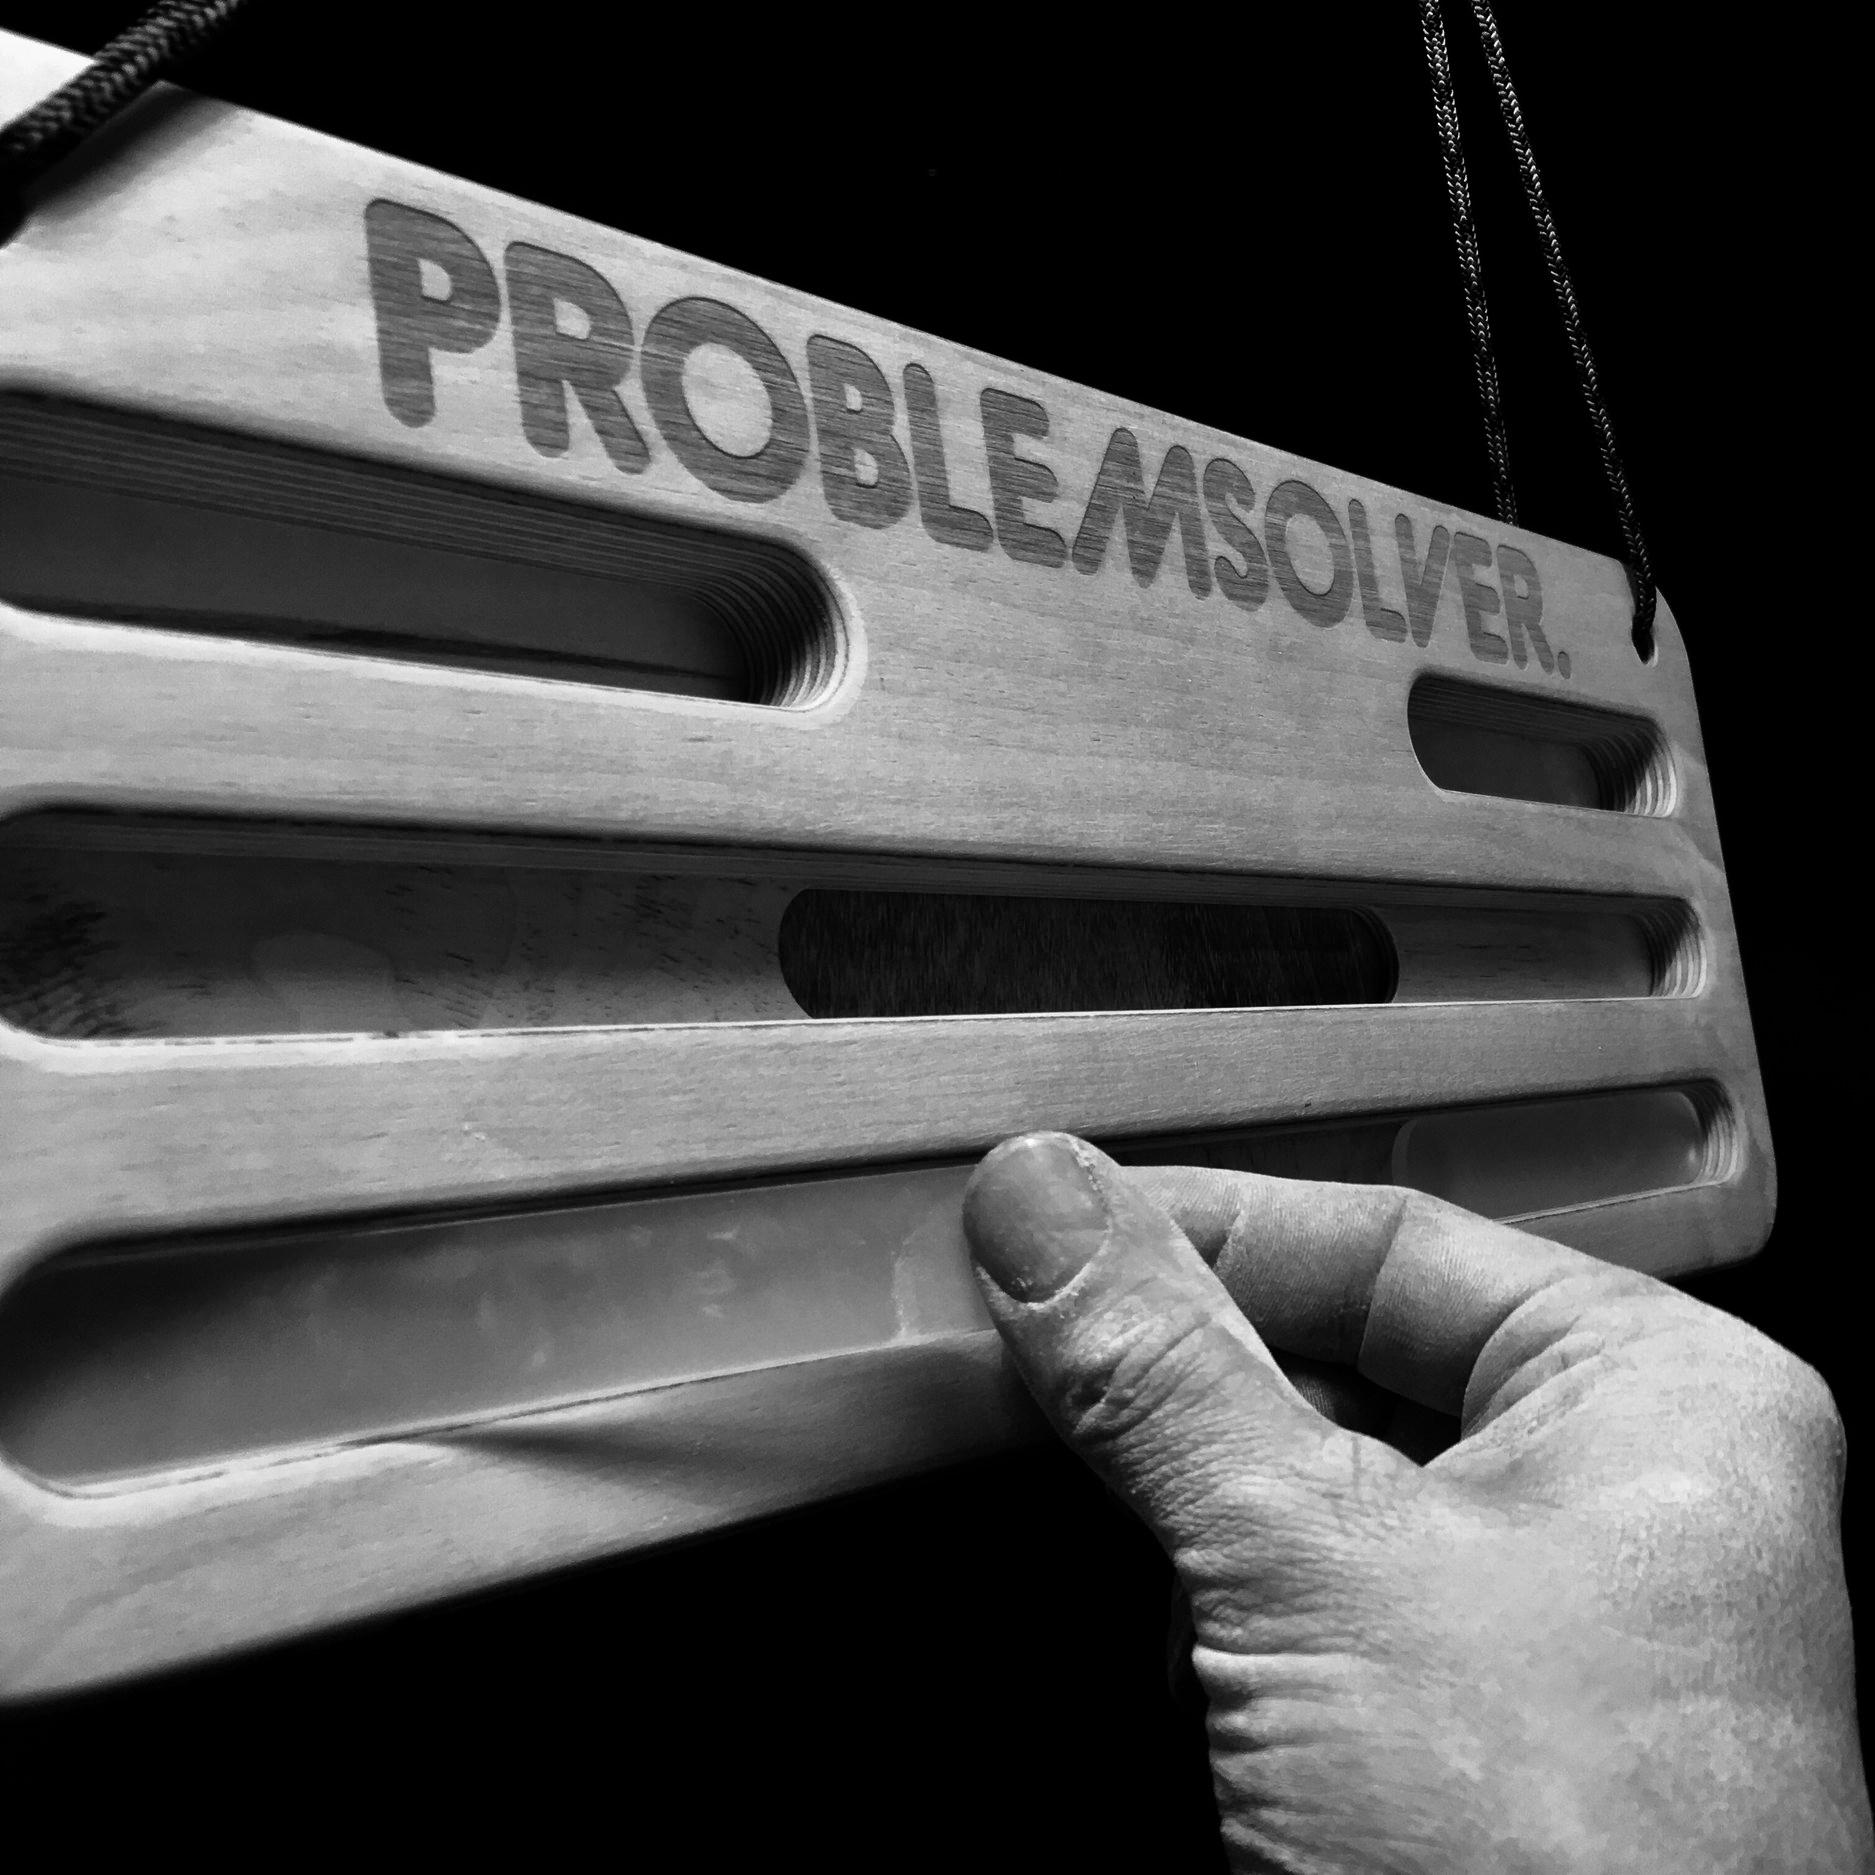 Problemsolver-hangboard-climbing-inserts